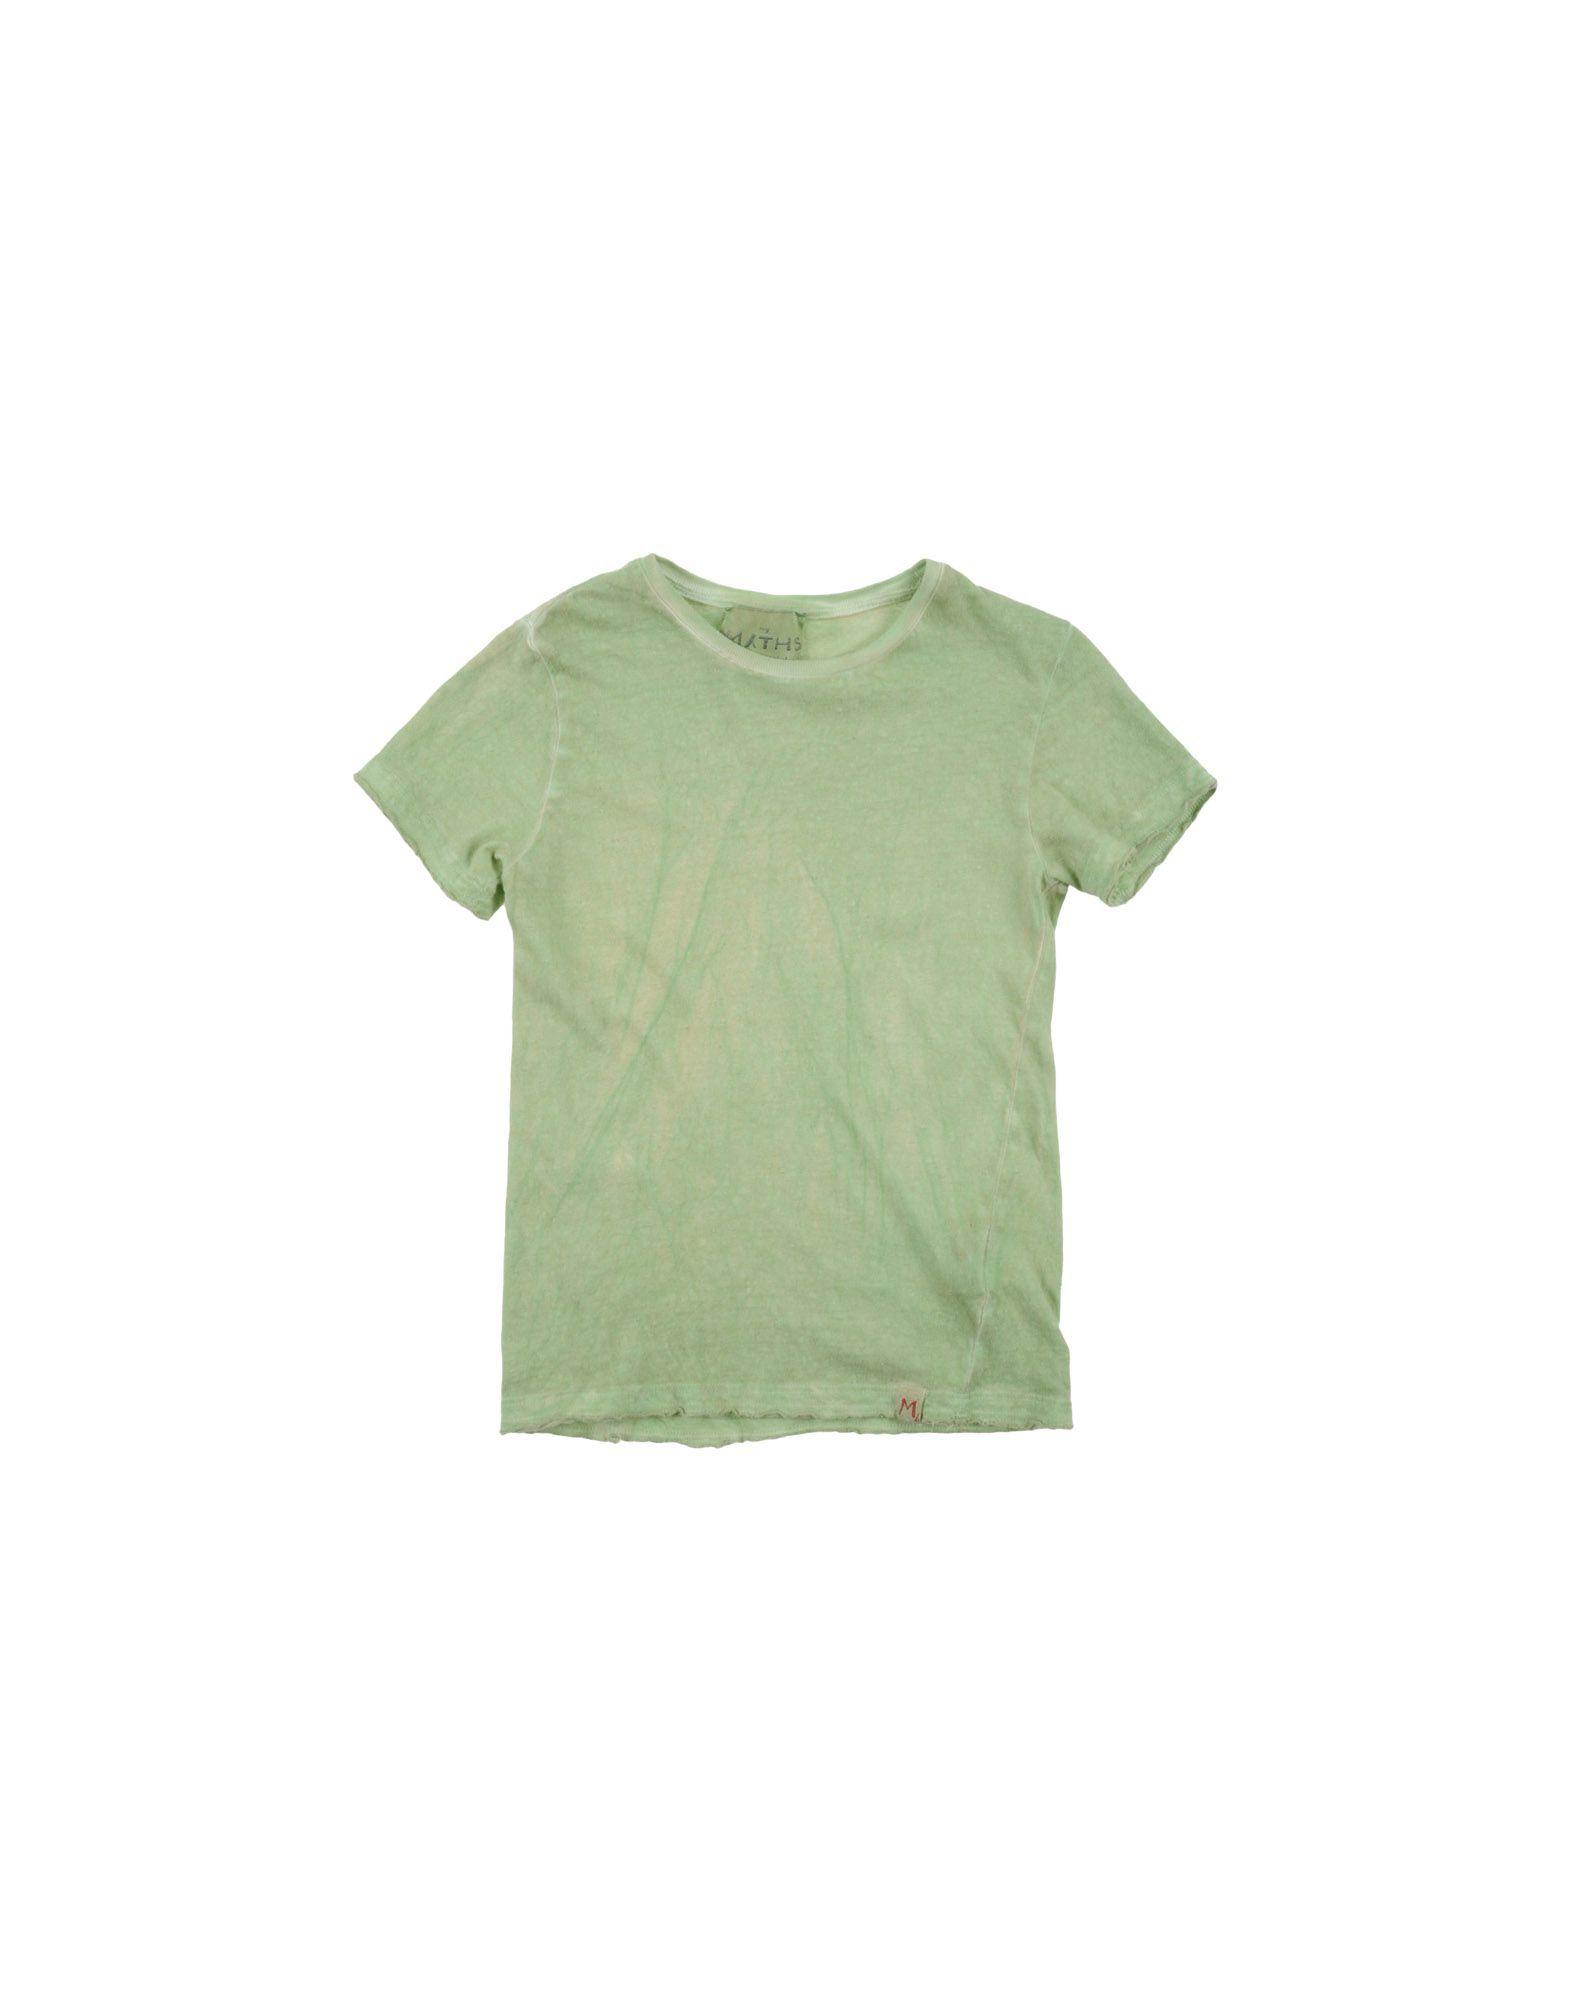 Myths Green Girl Cotton T-Shirt